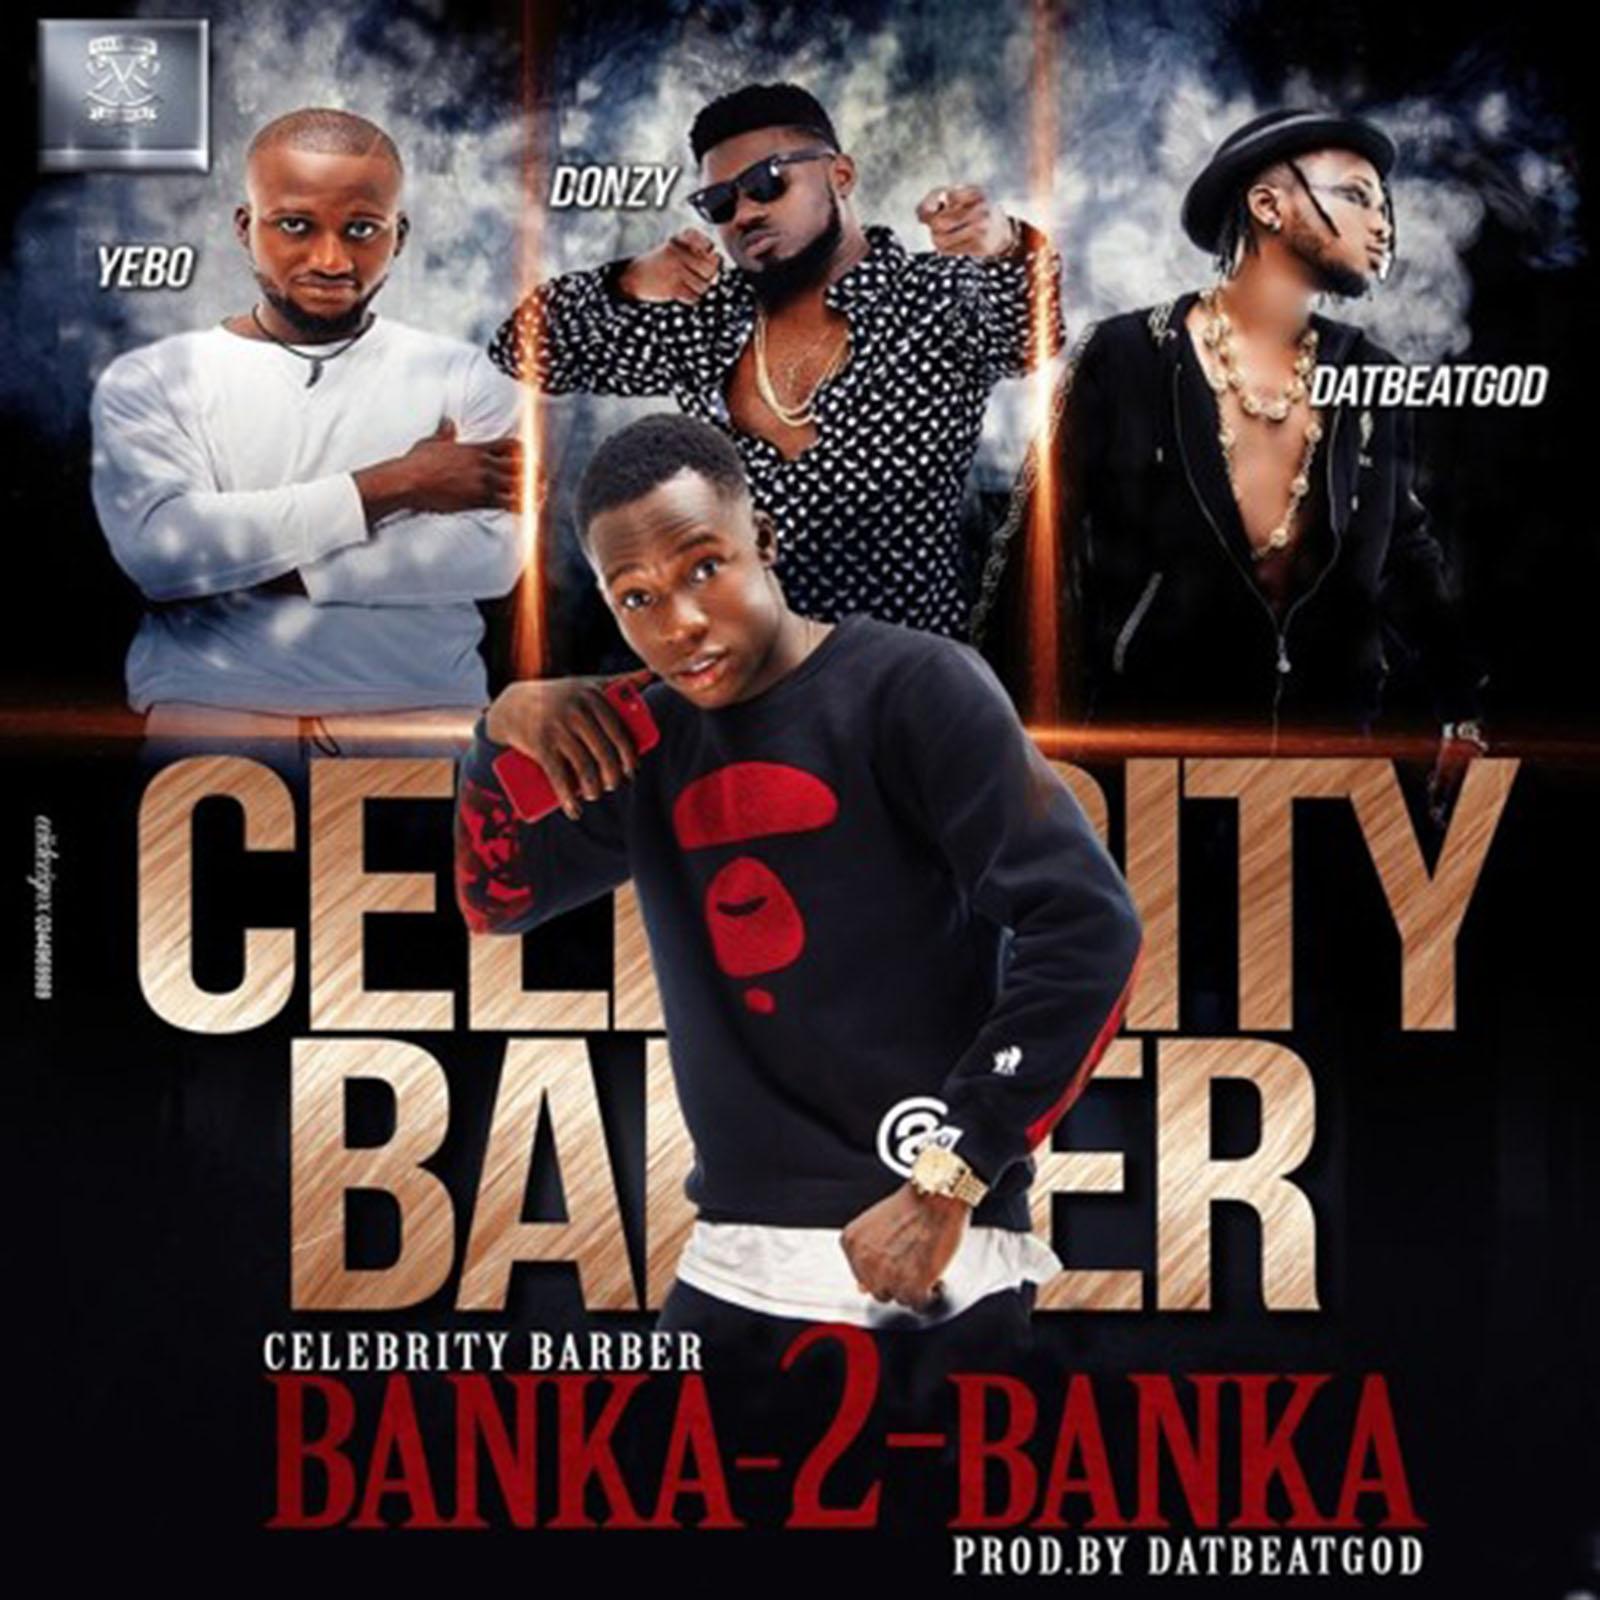 Banka 2 Banka by Celebrity Barber feat. Yebo, Donzy & DaBeatGod